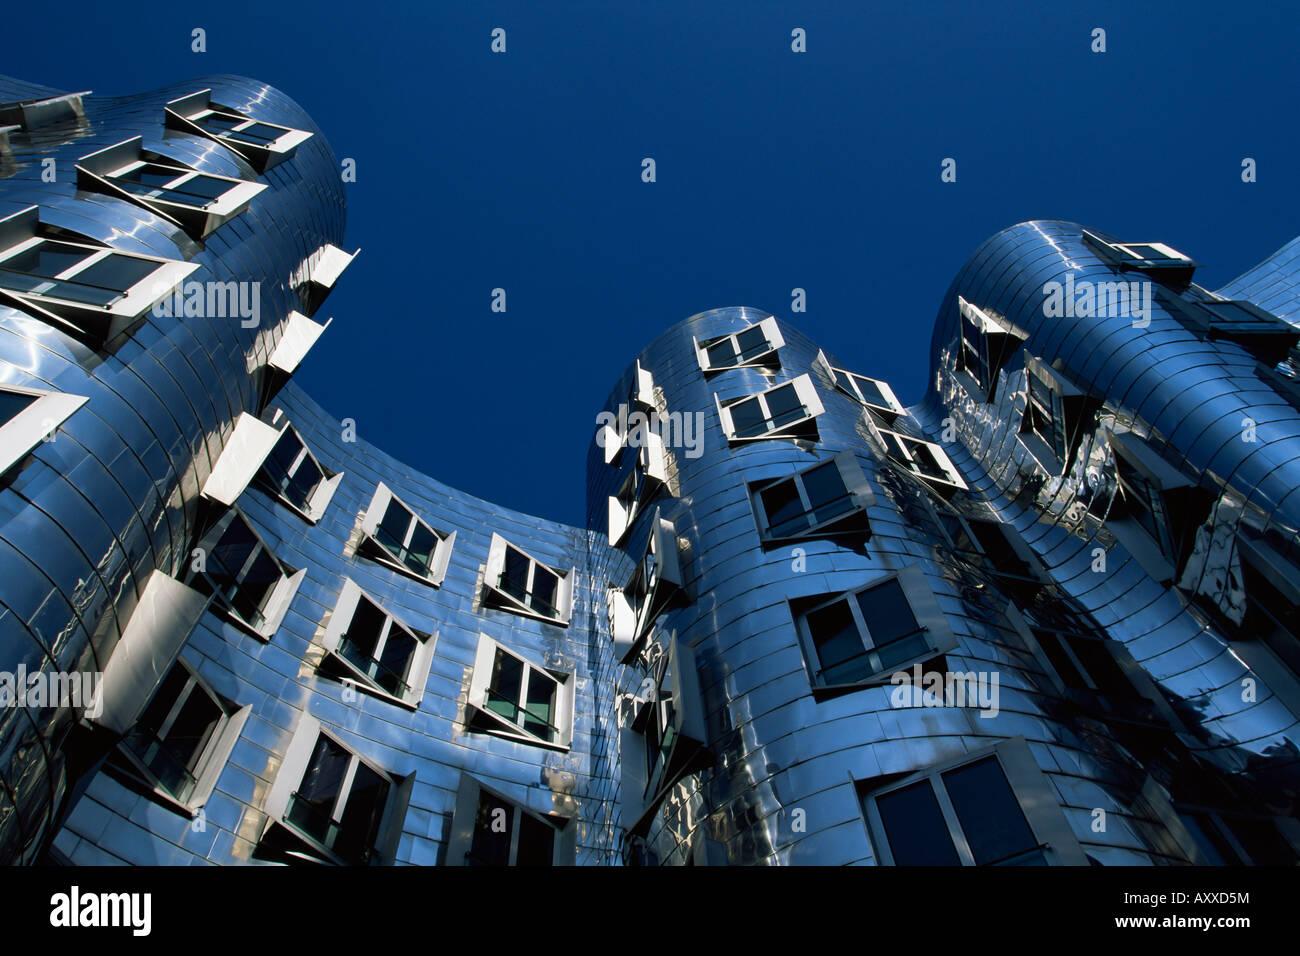 The Neuer Zollhof building by Frank Gehry, at the Medienhafen, Dusseldorf, Nord Rhine-Westphalia, Germany, Europe - Stock Image